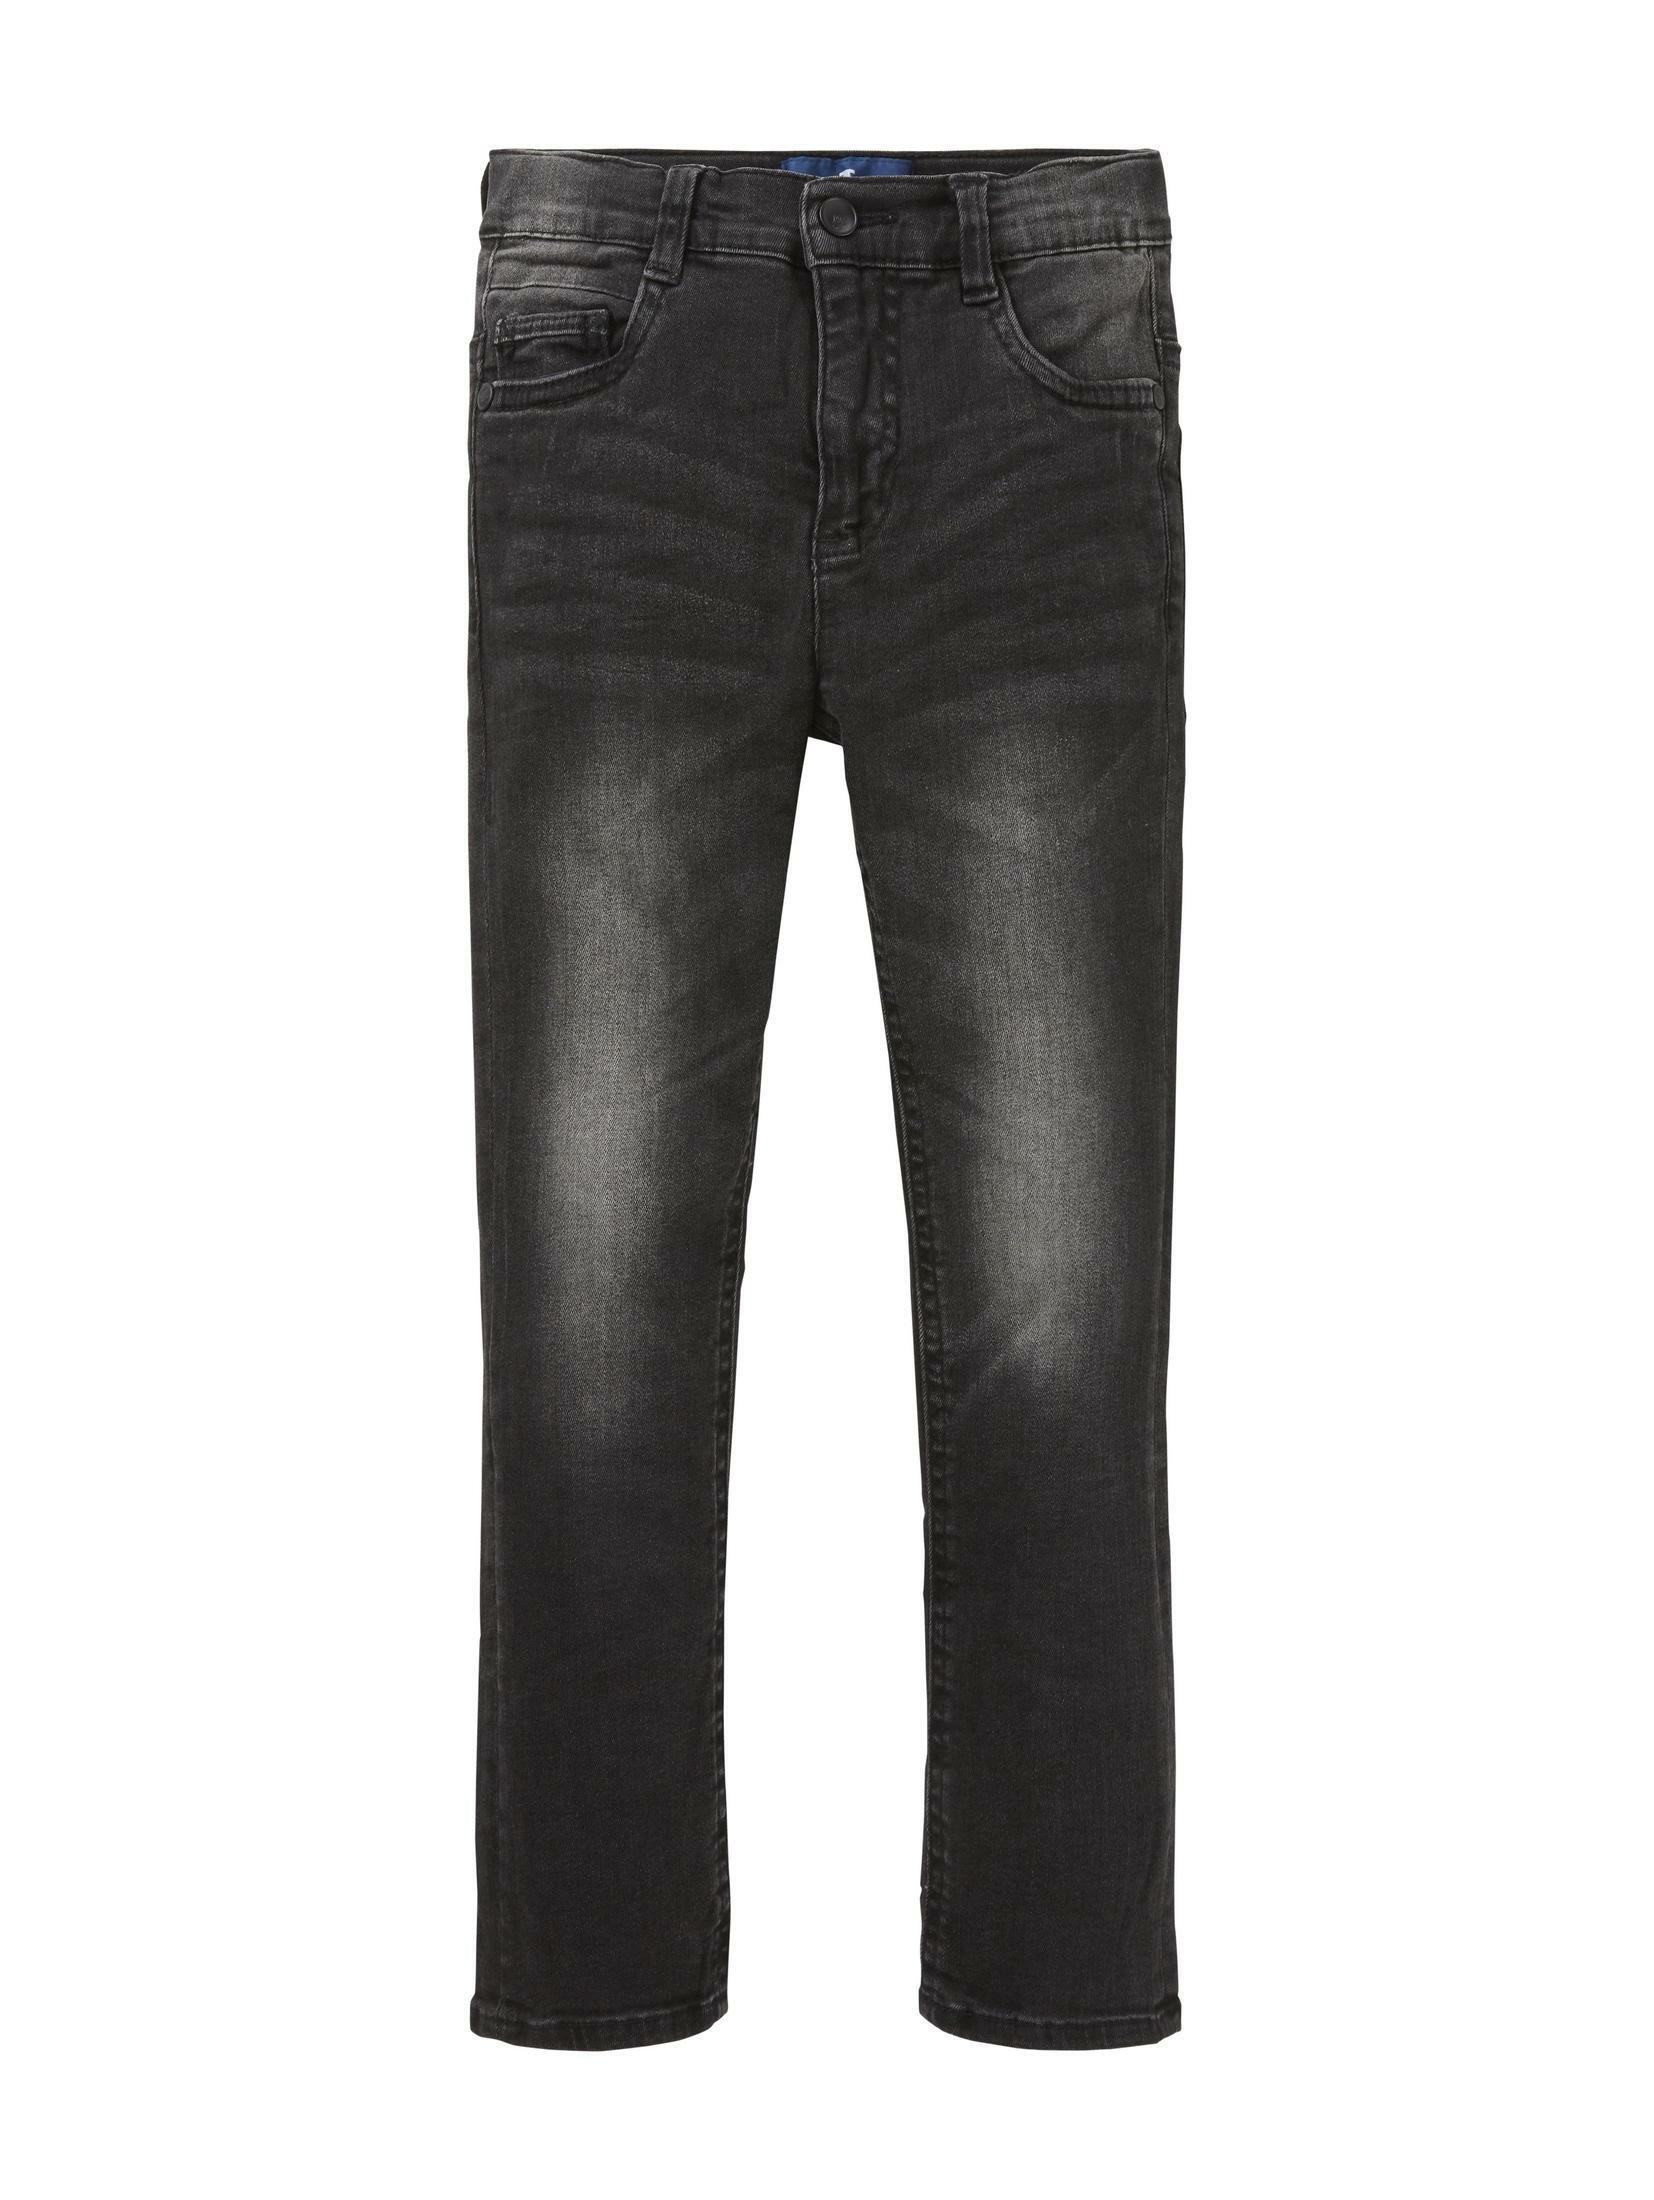 TOM TAILOR straight jeans »Schwarze Jeans« bij OTTO online kopen